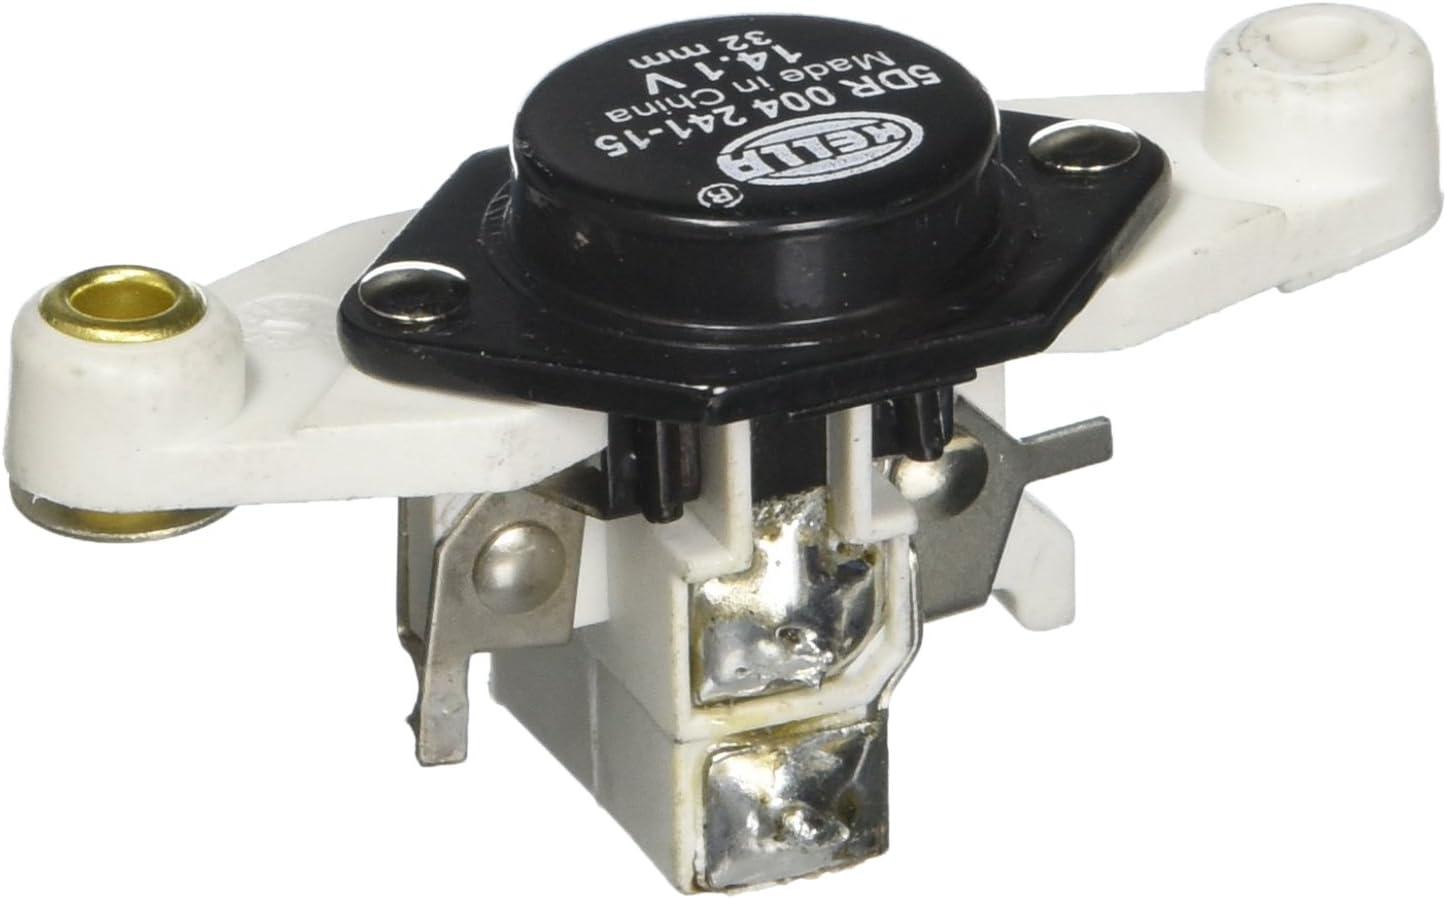 OPEL PORSCHE HELLA VW SEAT Alternator Voltage Regulator 12V 1954-2001